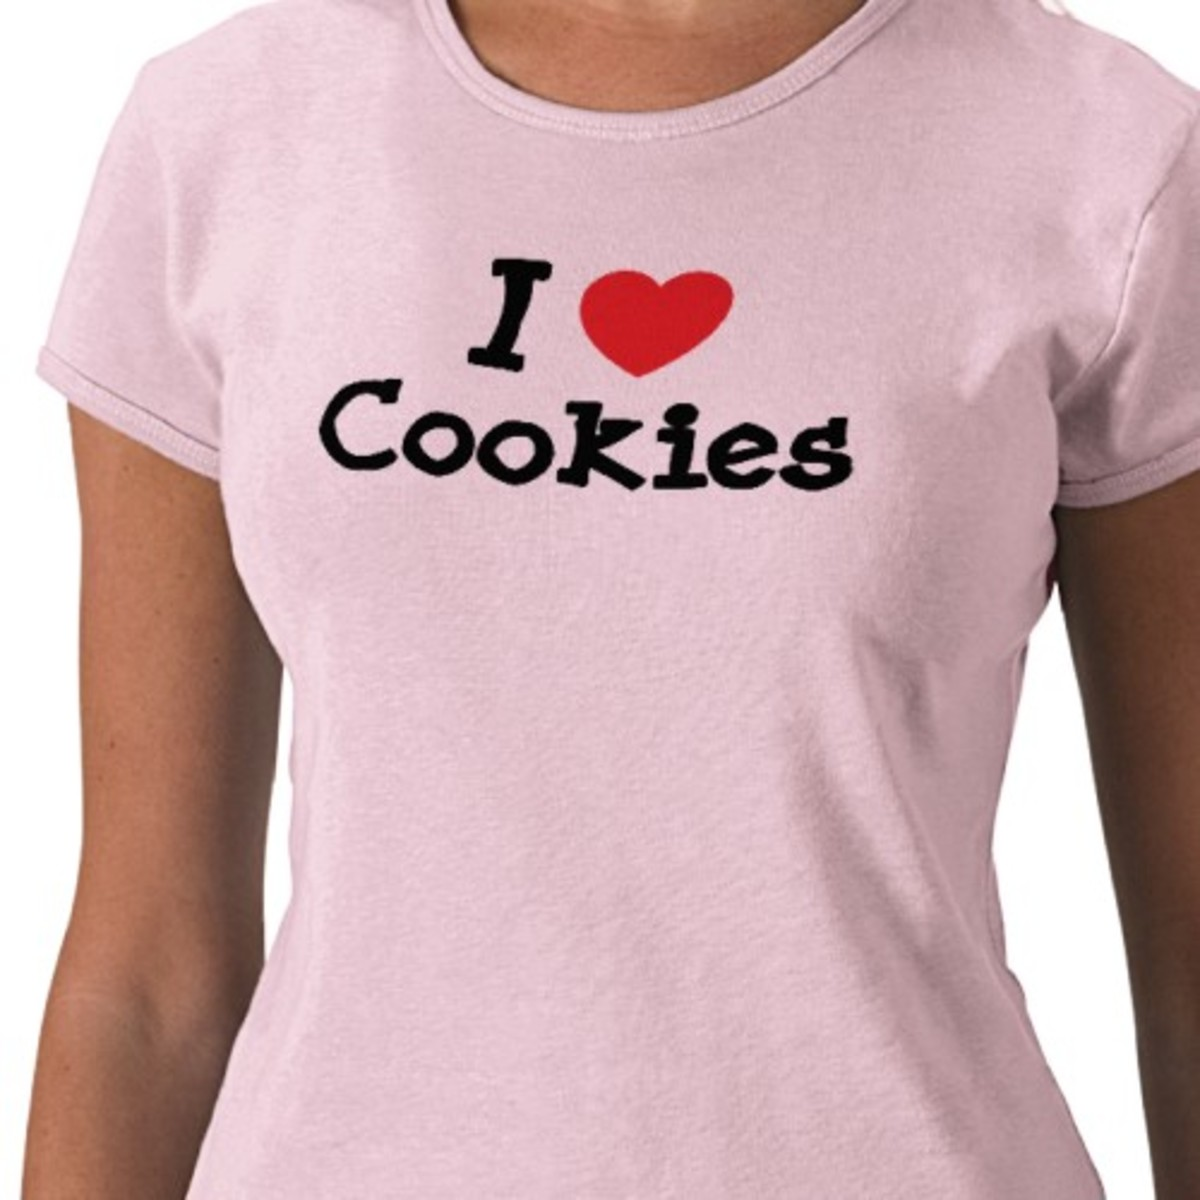 I Love Cookies T-Shirt